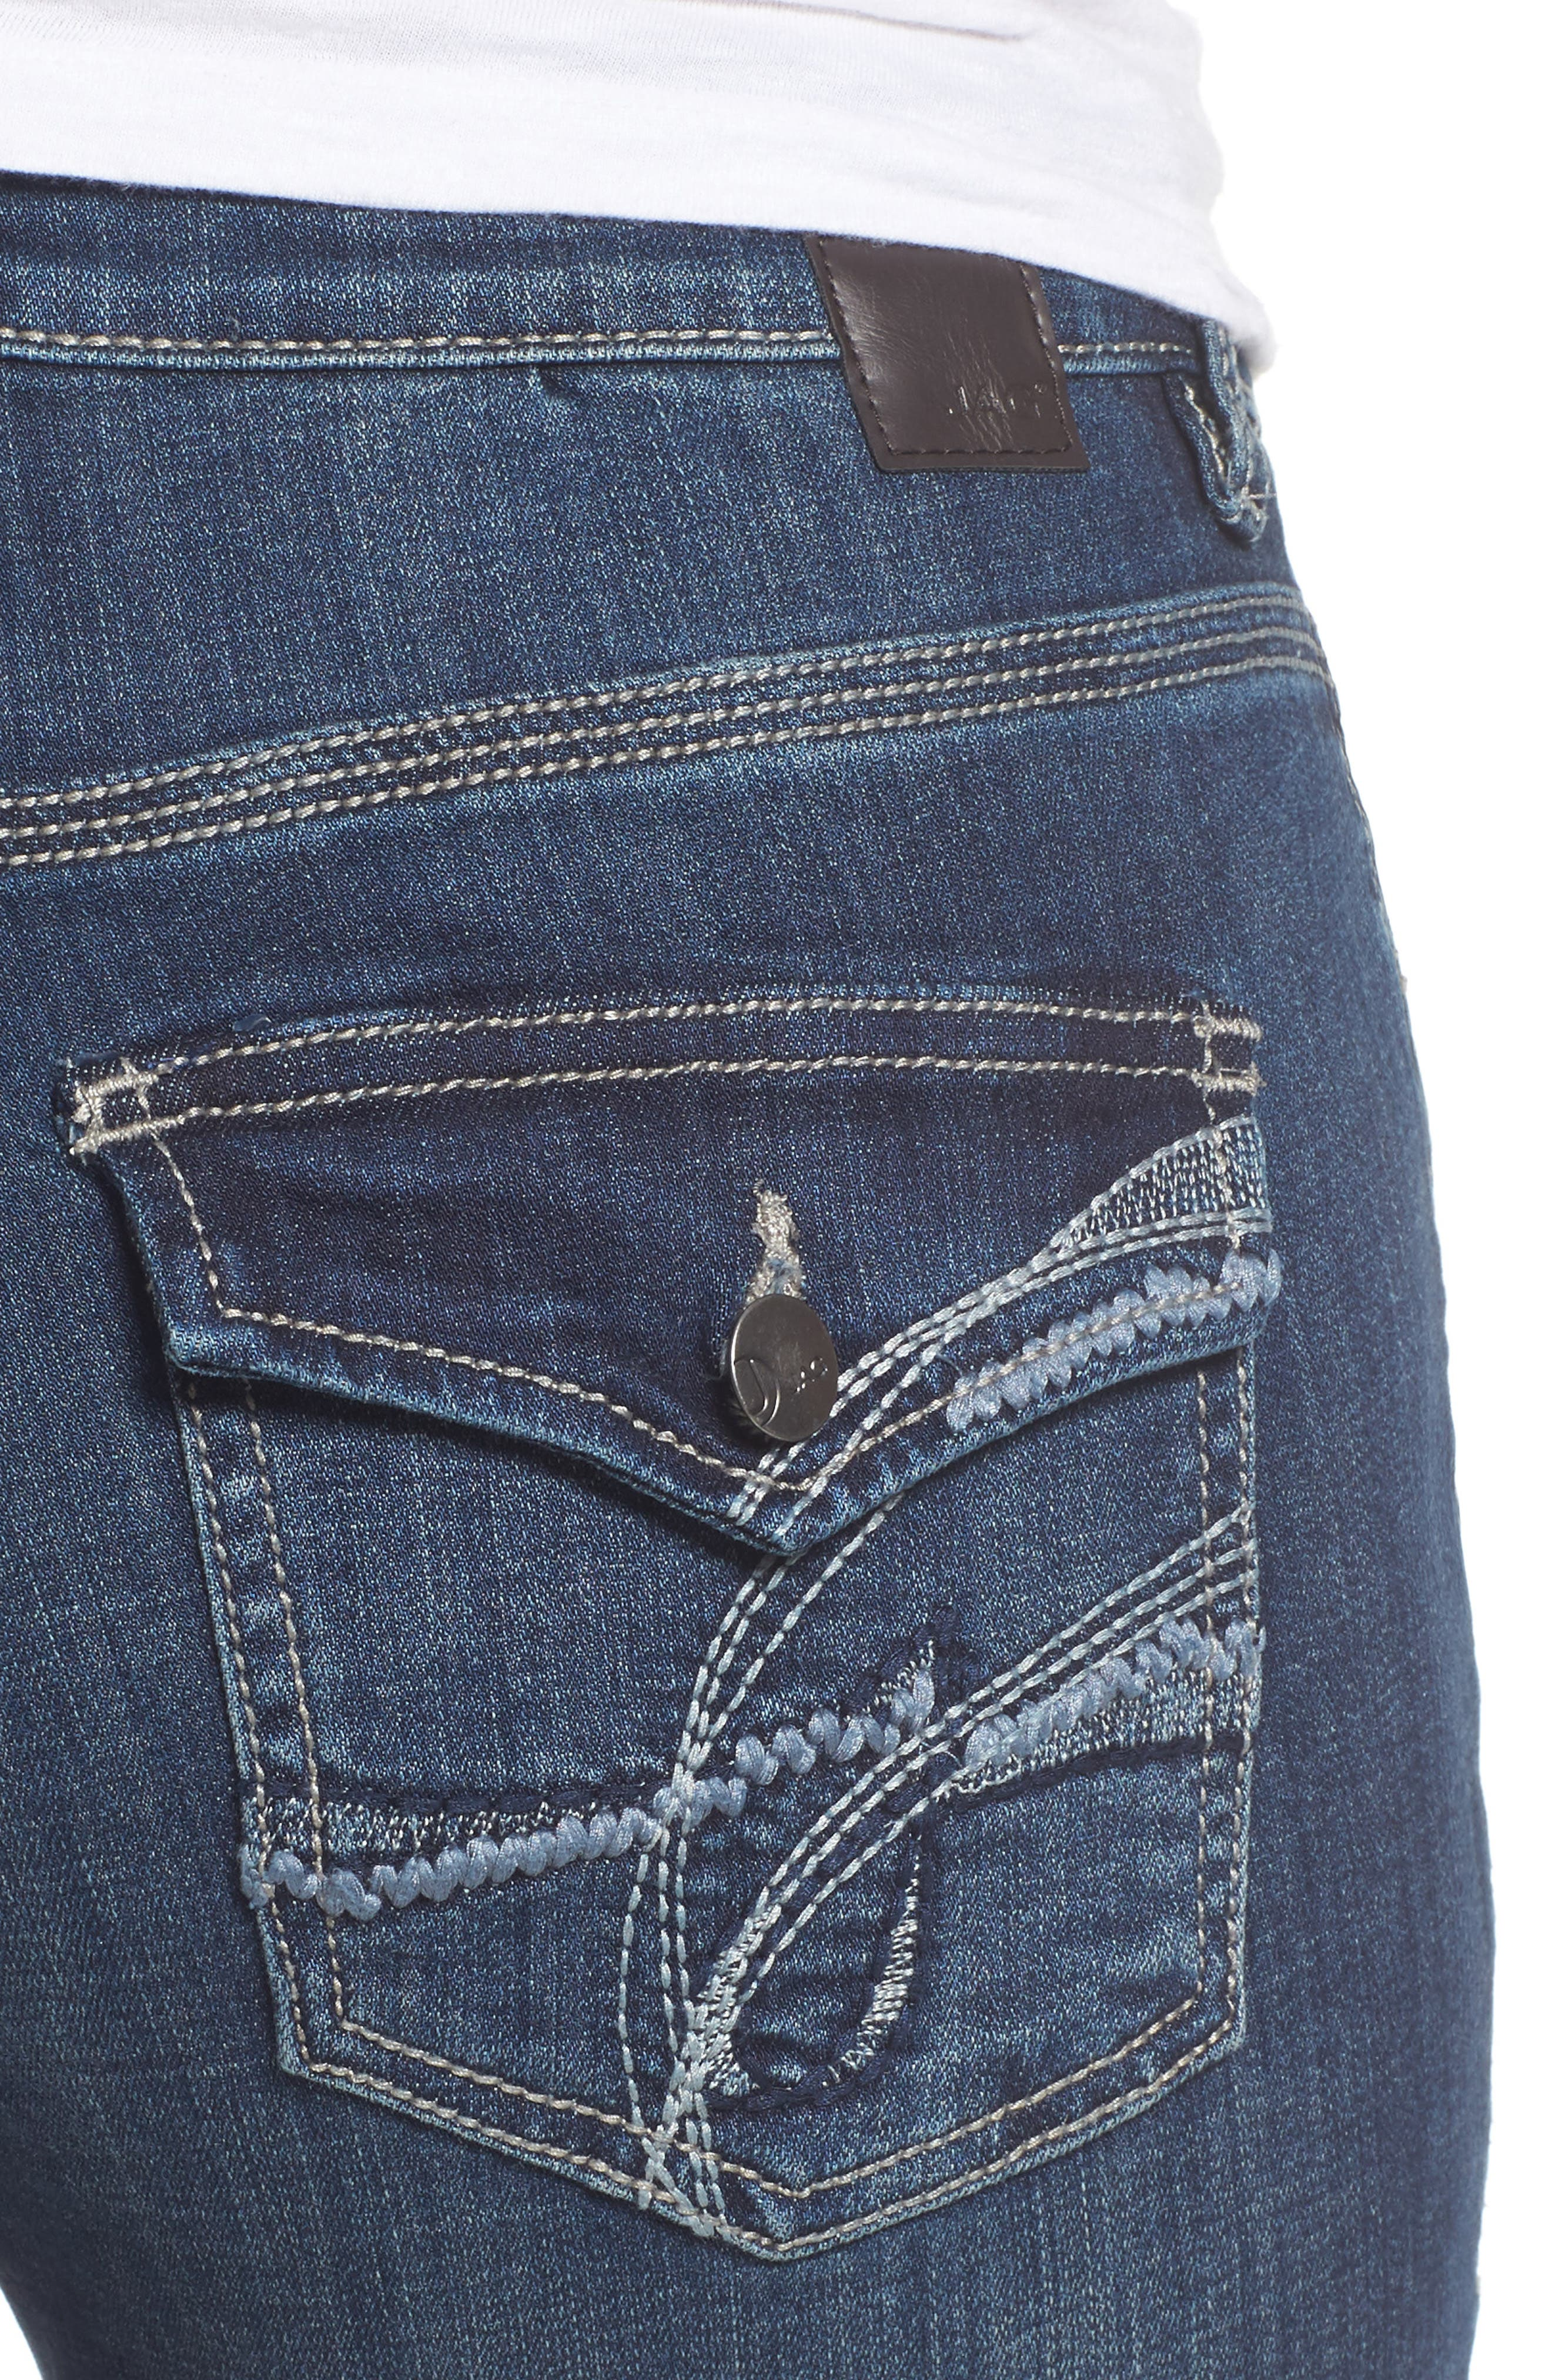 Adrian Straight Leg Jeans,                             Alternate thumbnail 4, color,                             Thorne Blue